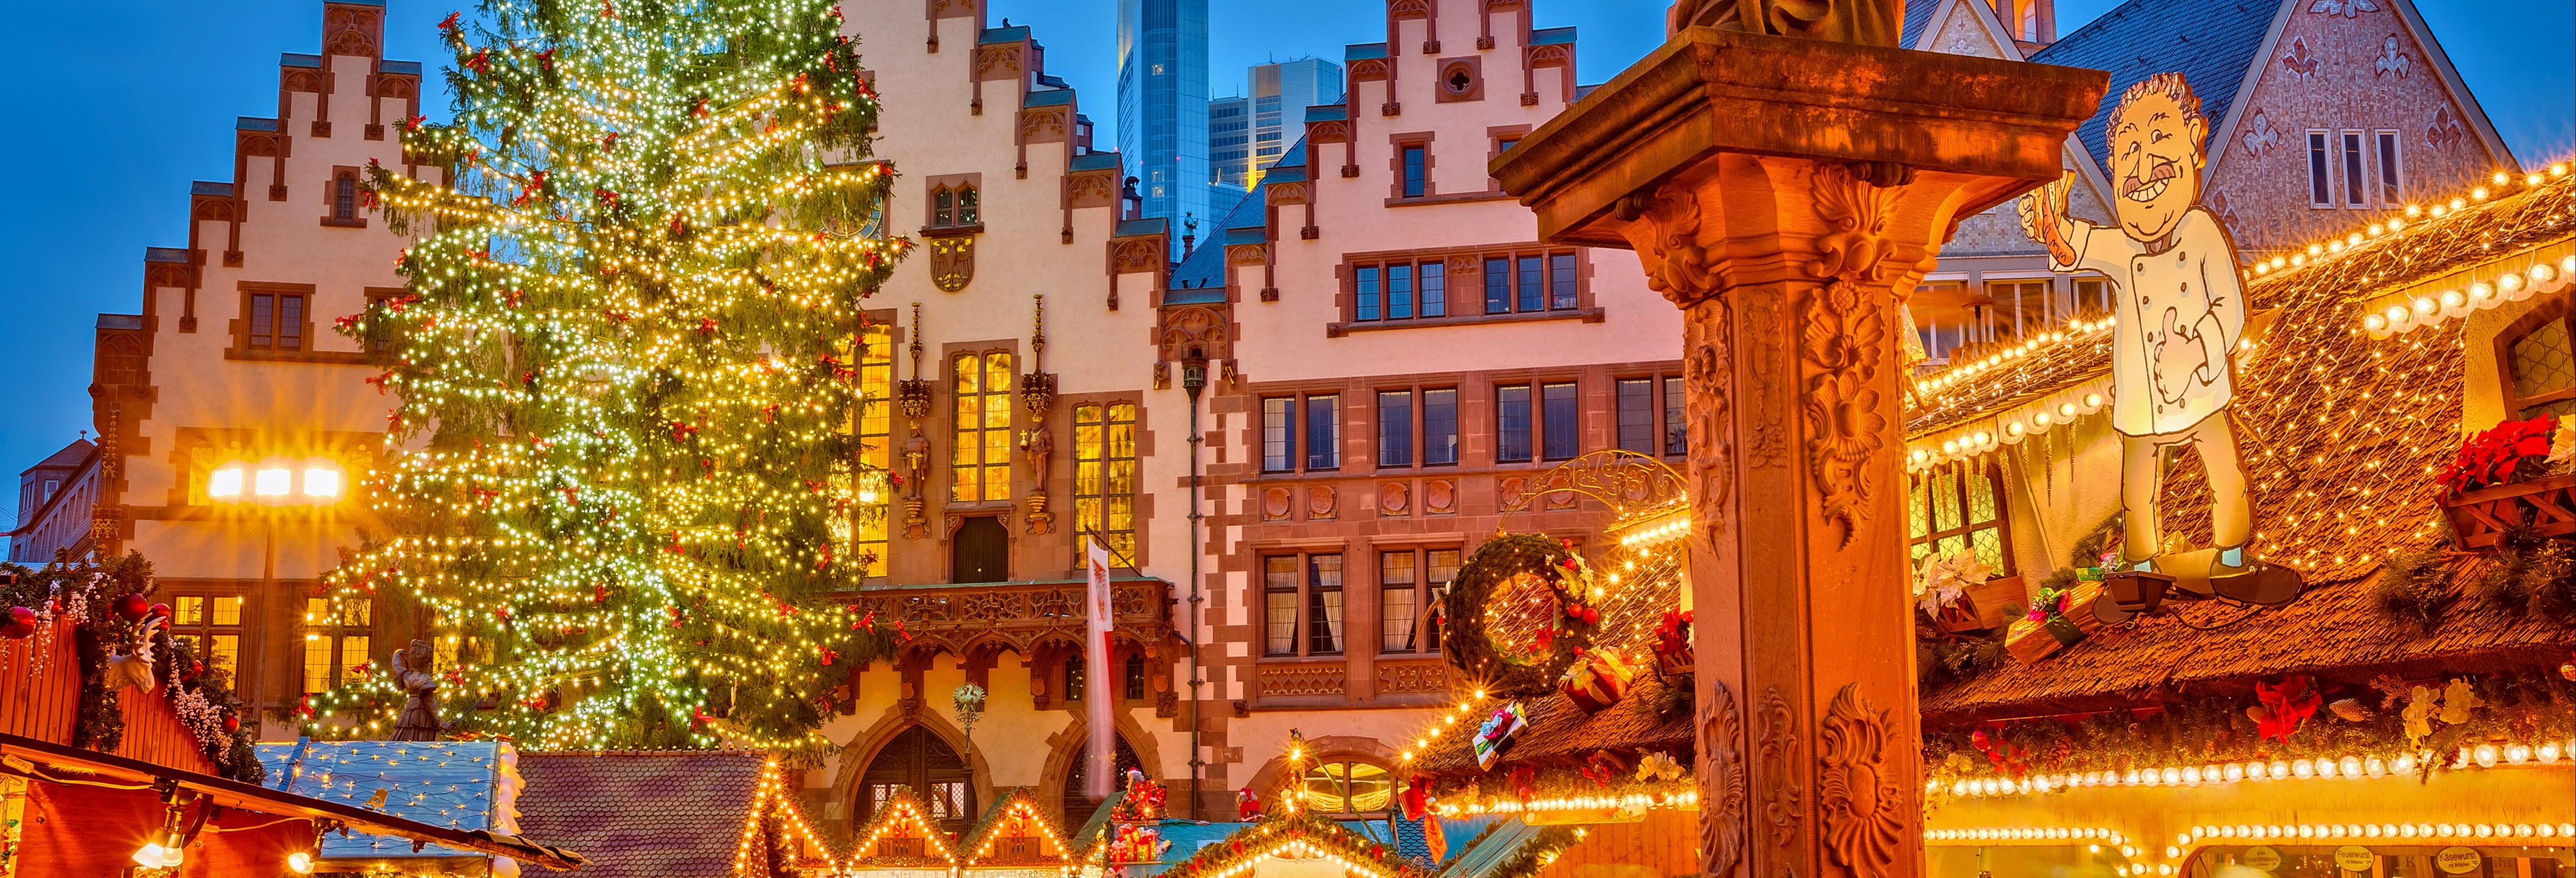 Frankfurt Christmas Market Tour